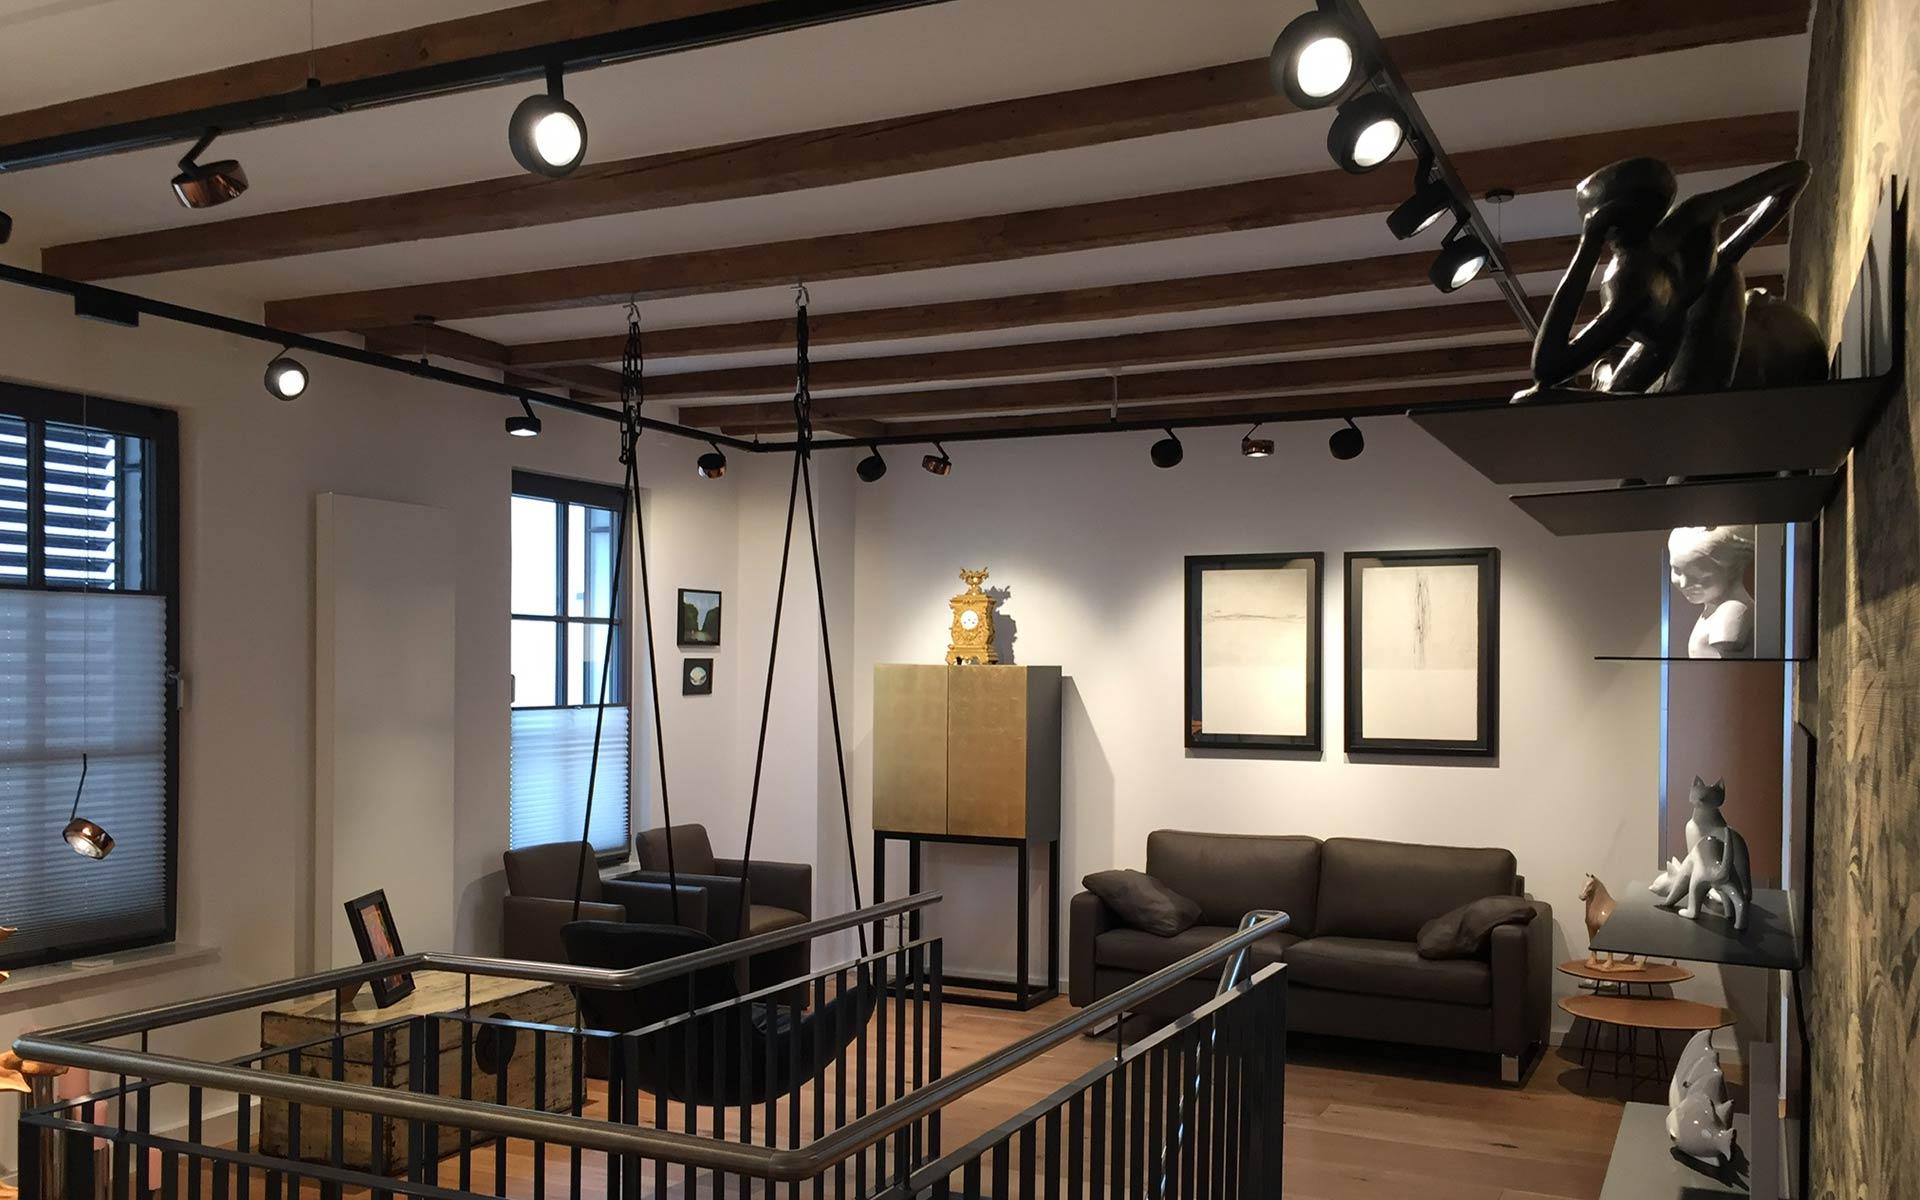 Occhio Beleuchtung an Erco Stromschiene - Interiordesign steidten+ Berlin